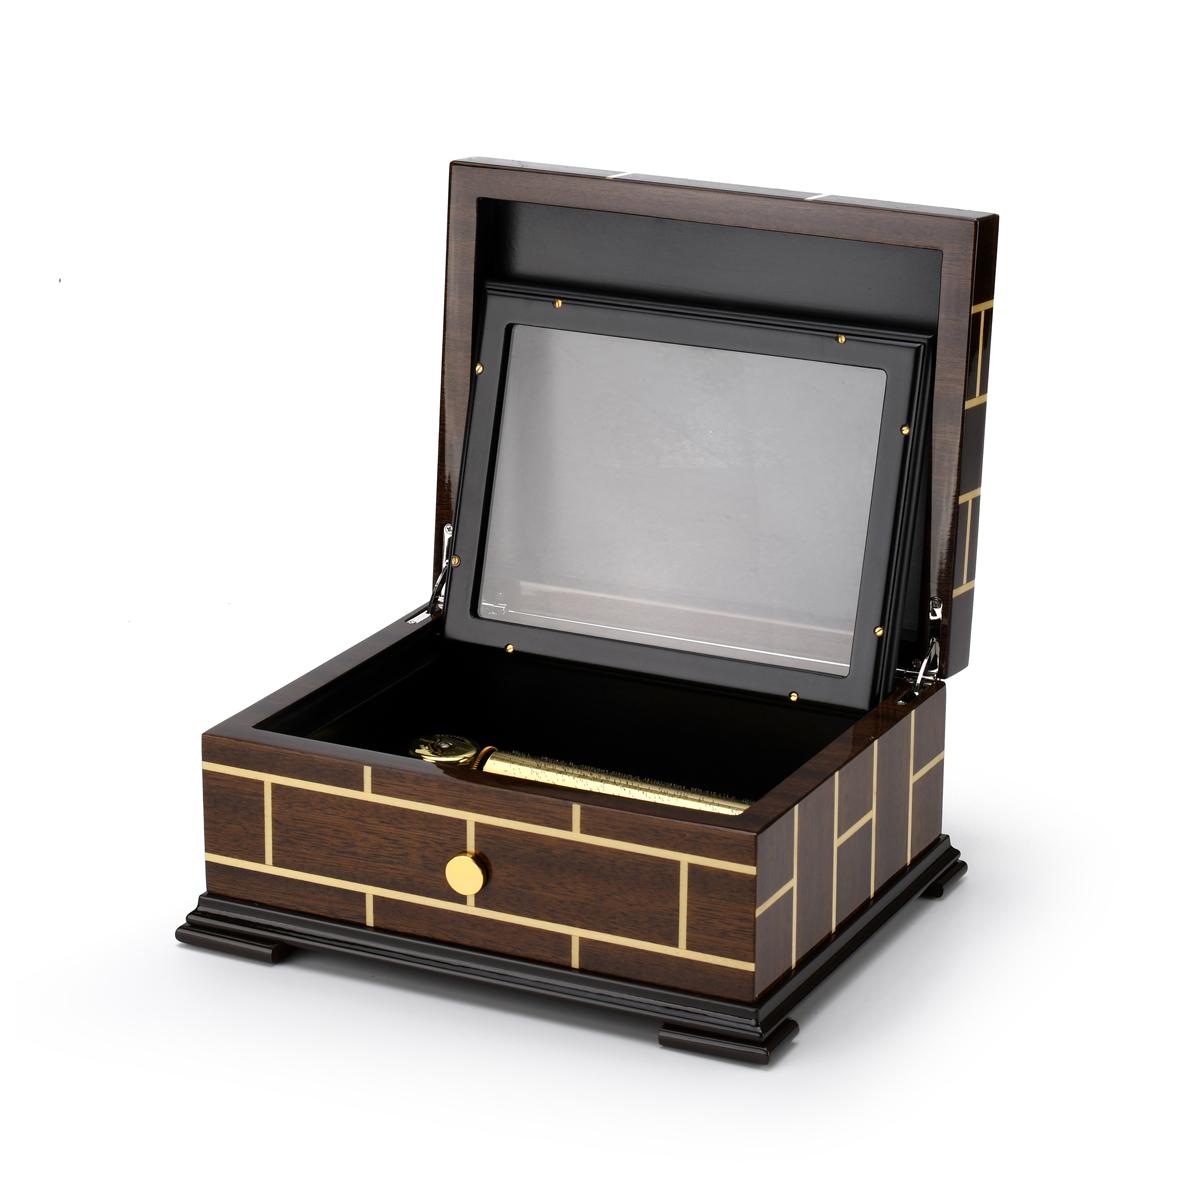 Brilliant Wood Tone Modern Masonry Design 72 Note Reuge Music Box